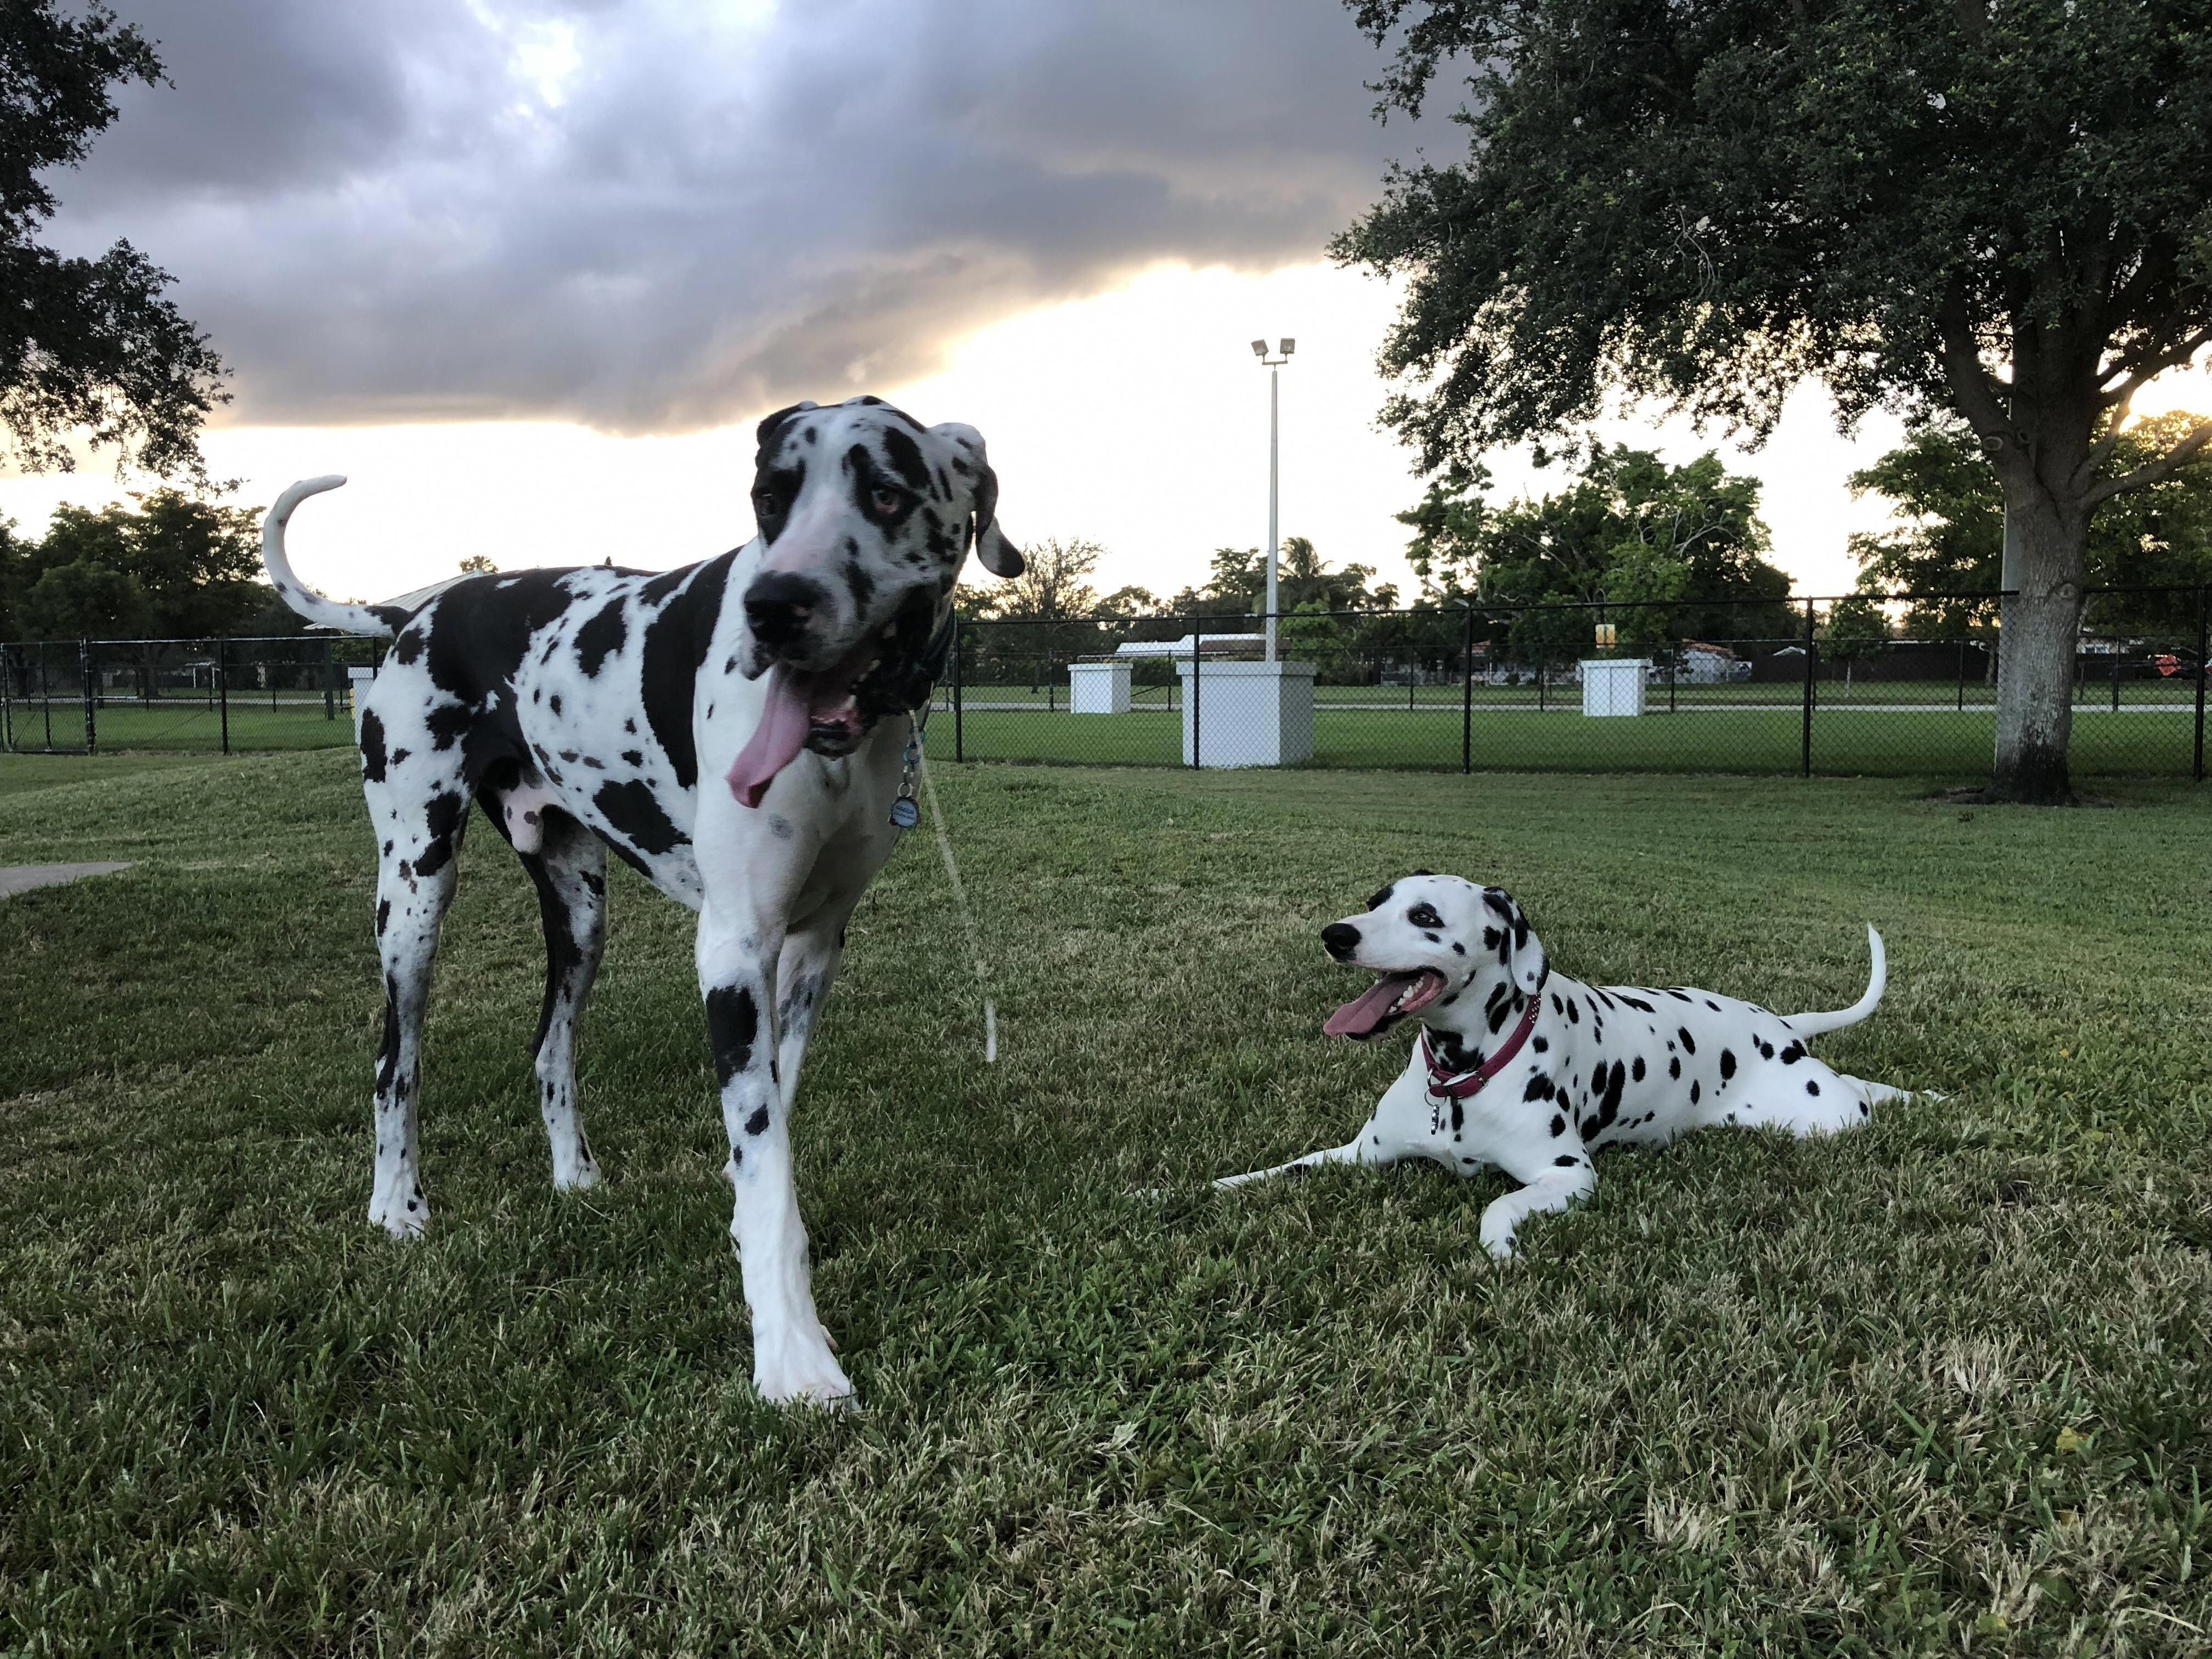 Daily Great Dane Thedailygreatdane Instagram Posts Videos Stories On Picoji Com Harlequin Great Danes Great Dane Great Dane Dogs